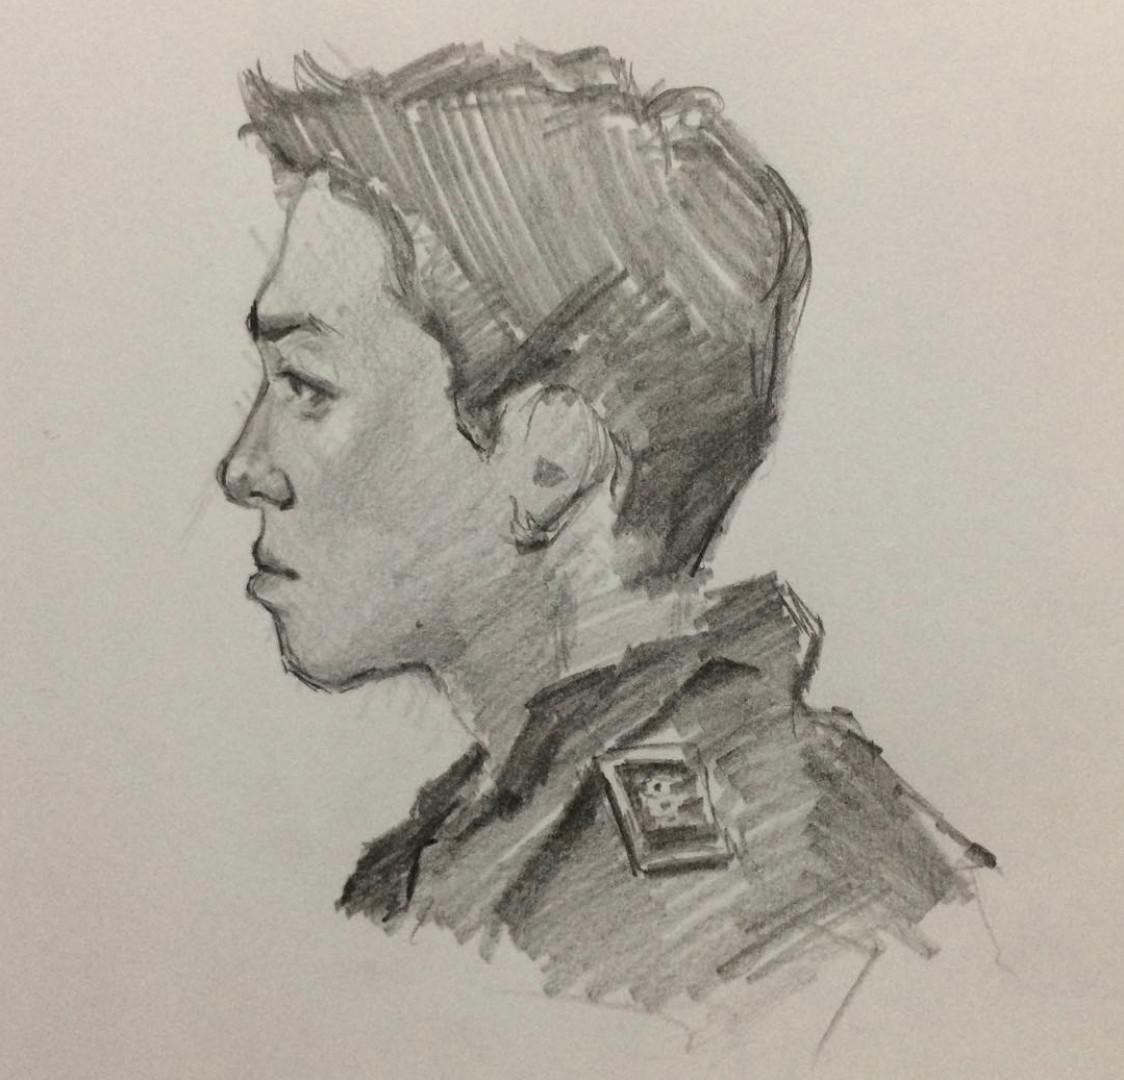 Prison Playbook Sketch